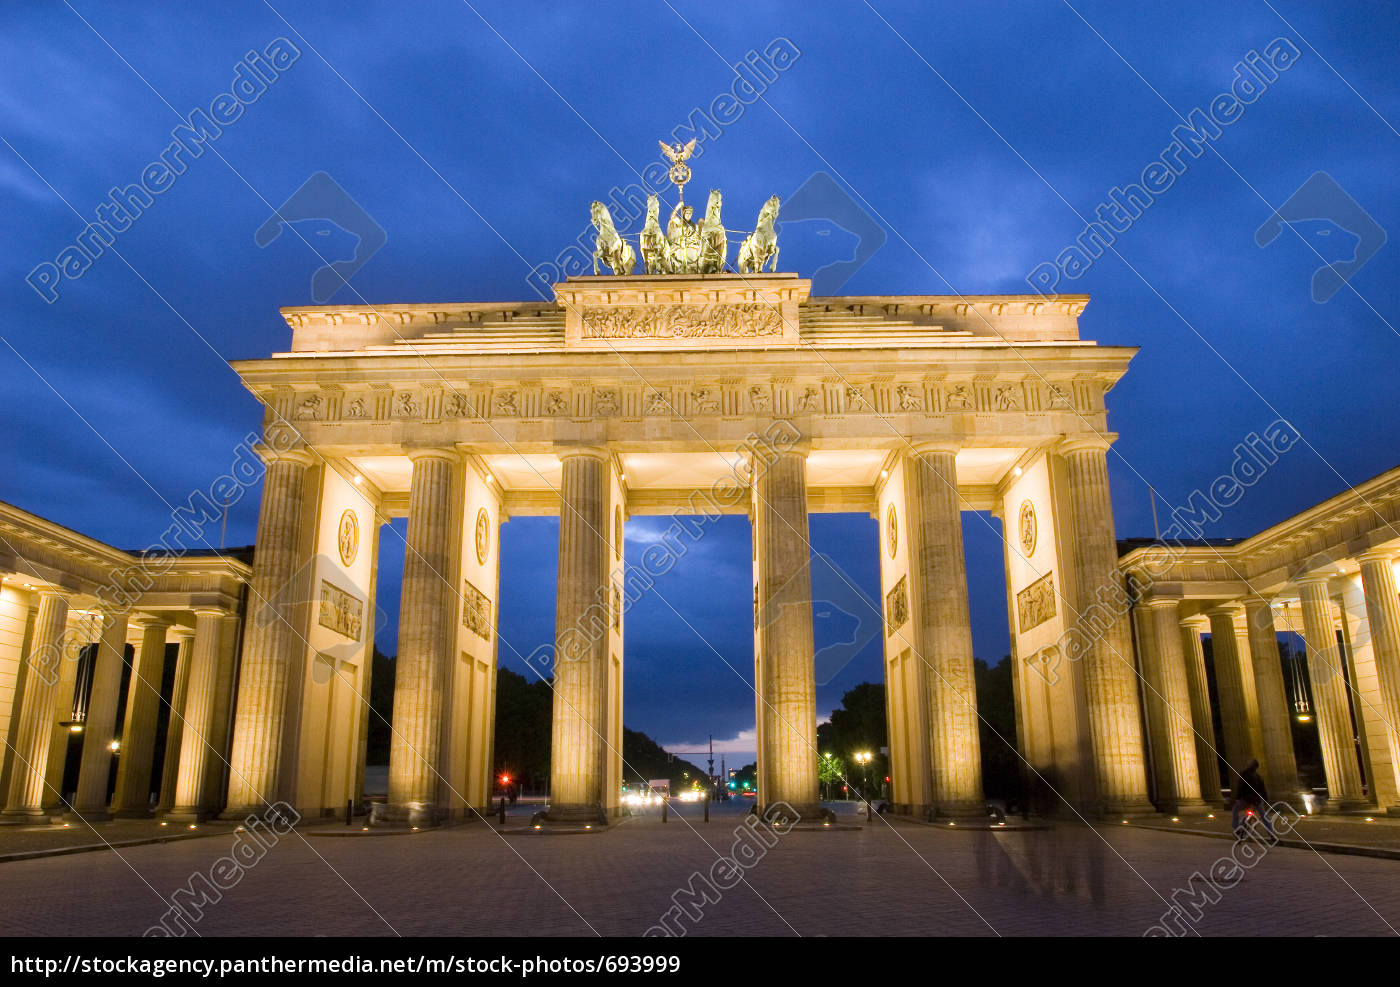 berlin, brandenburg, gate, germany - 693999